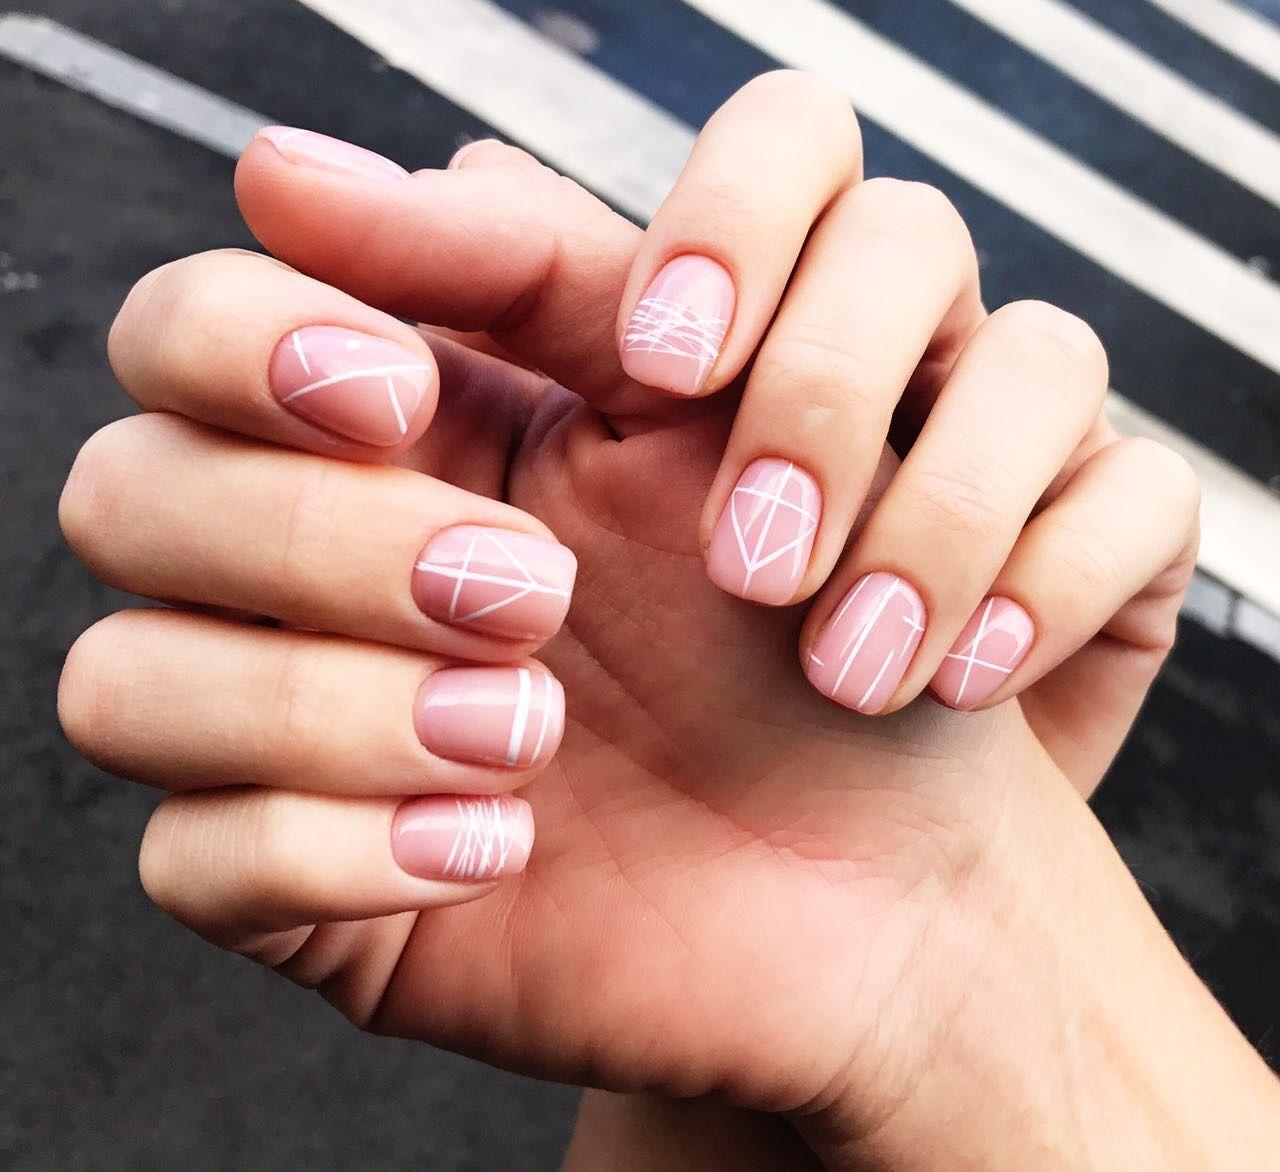 Pin de Розовая Принцесса en manicure | Manicura de uñas, Uñas doradas, Manicura para uñas cortas